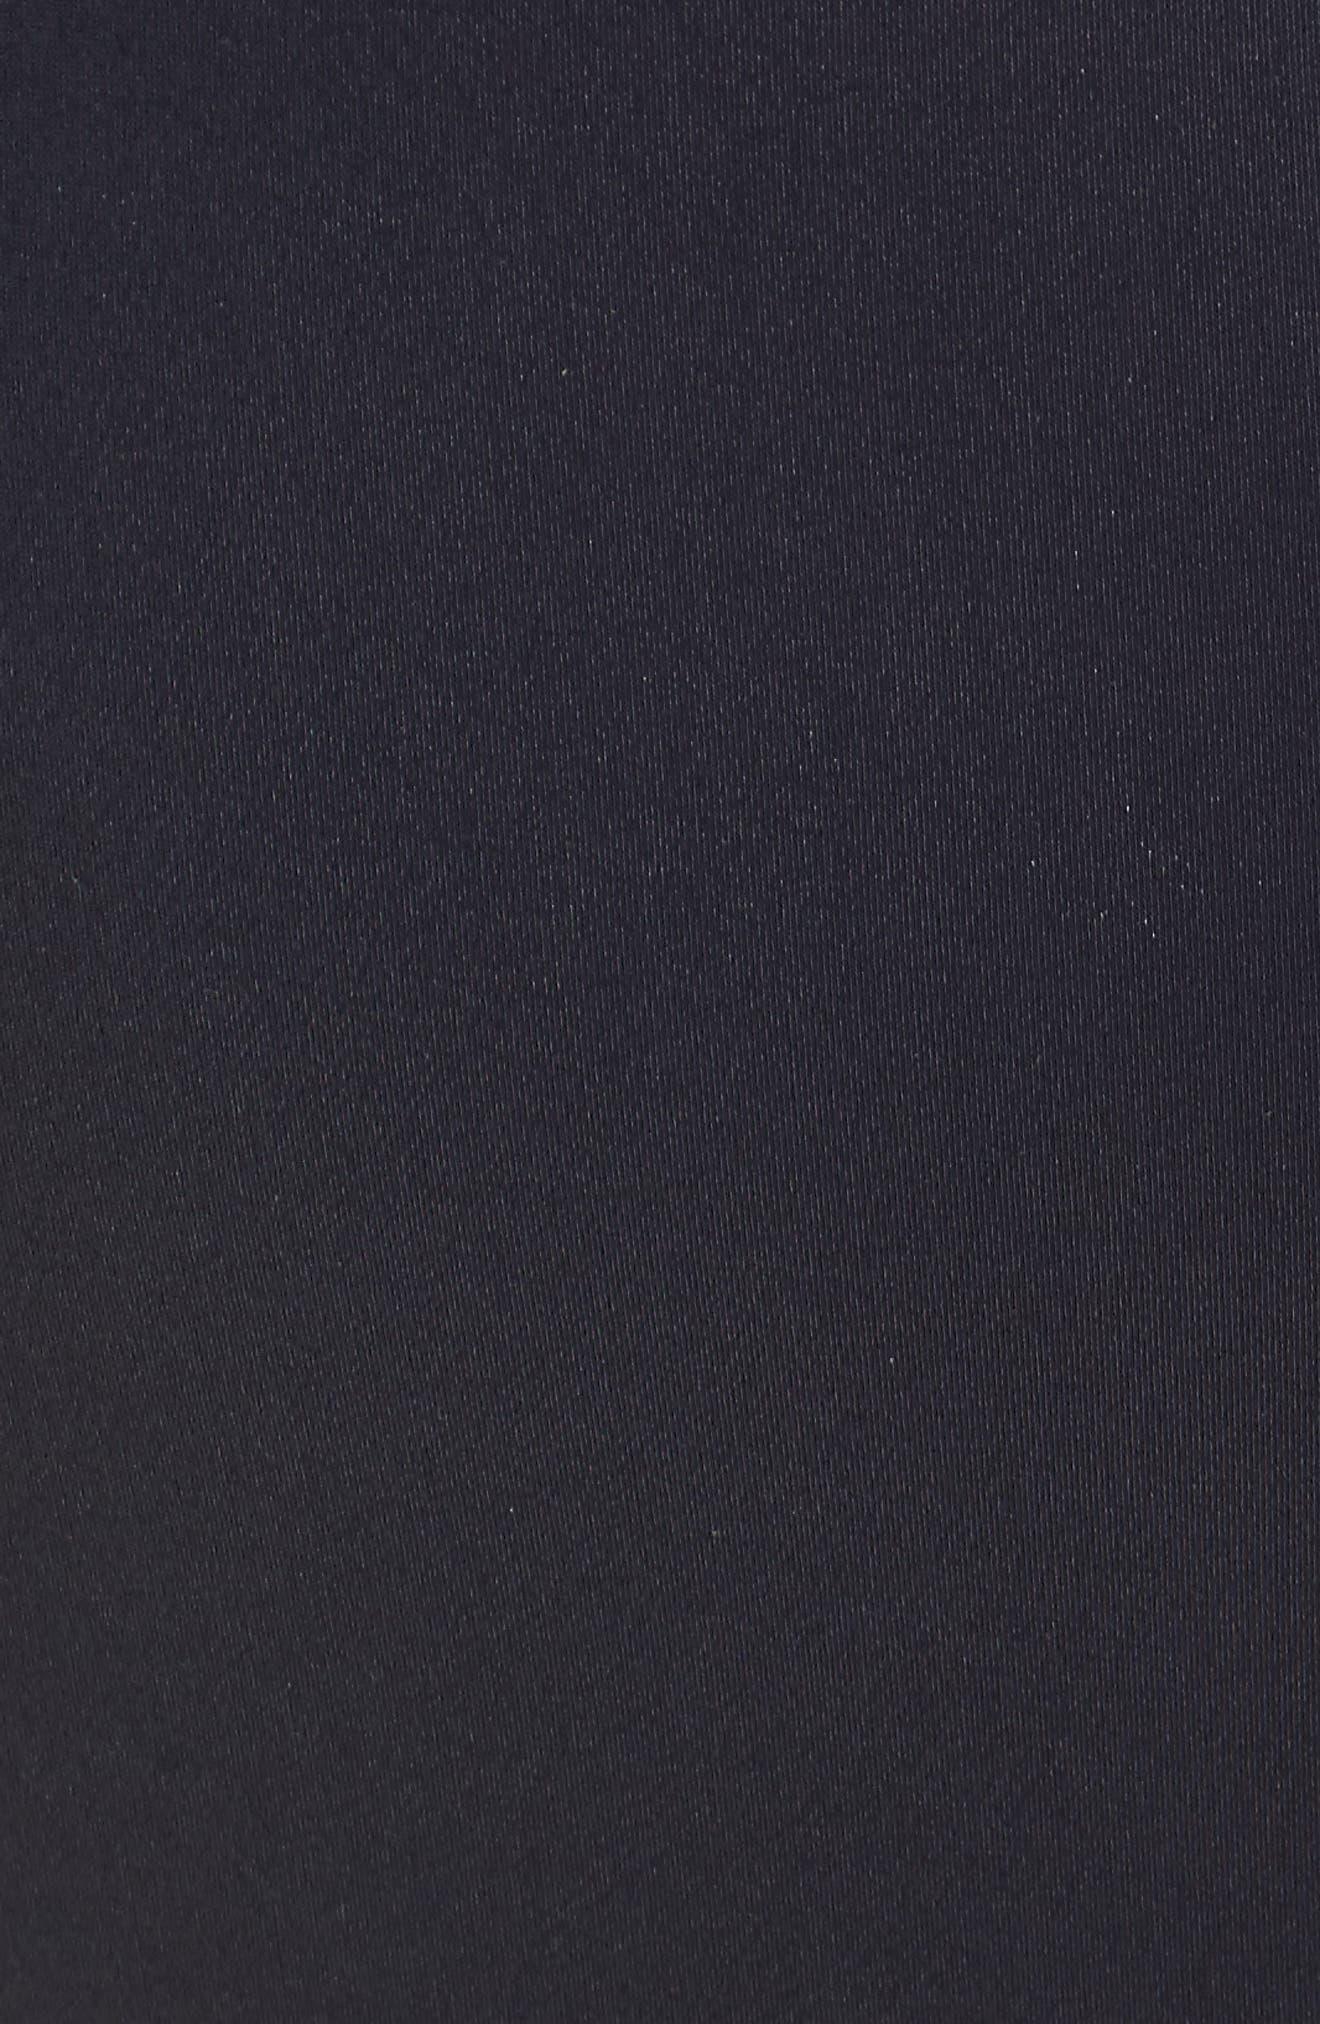 Alternate Image 5  - Profile by Gottex Casablanca High Neck One-Piece Swimsuit (Plus Size)